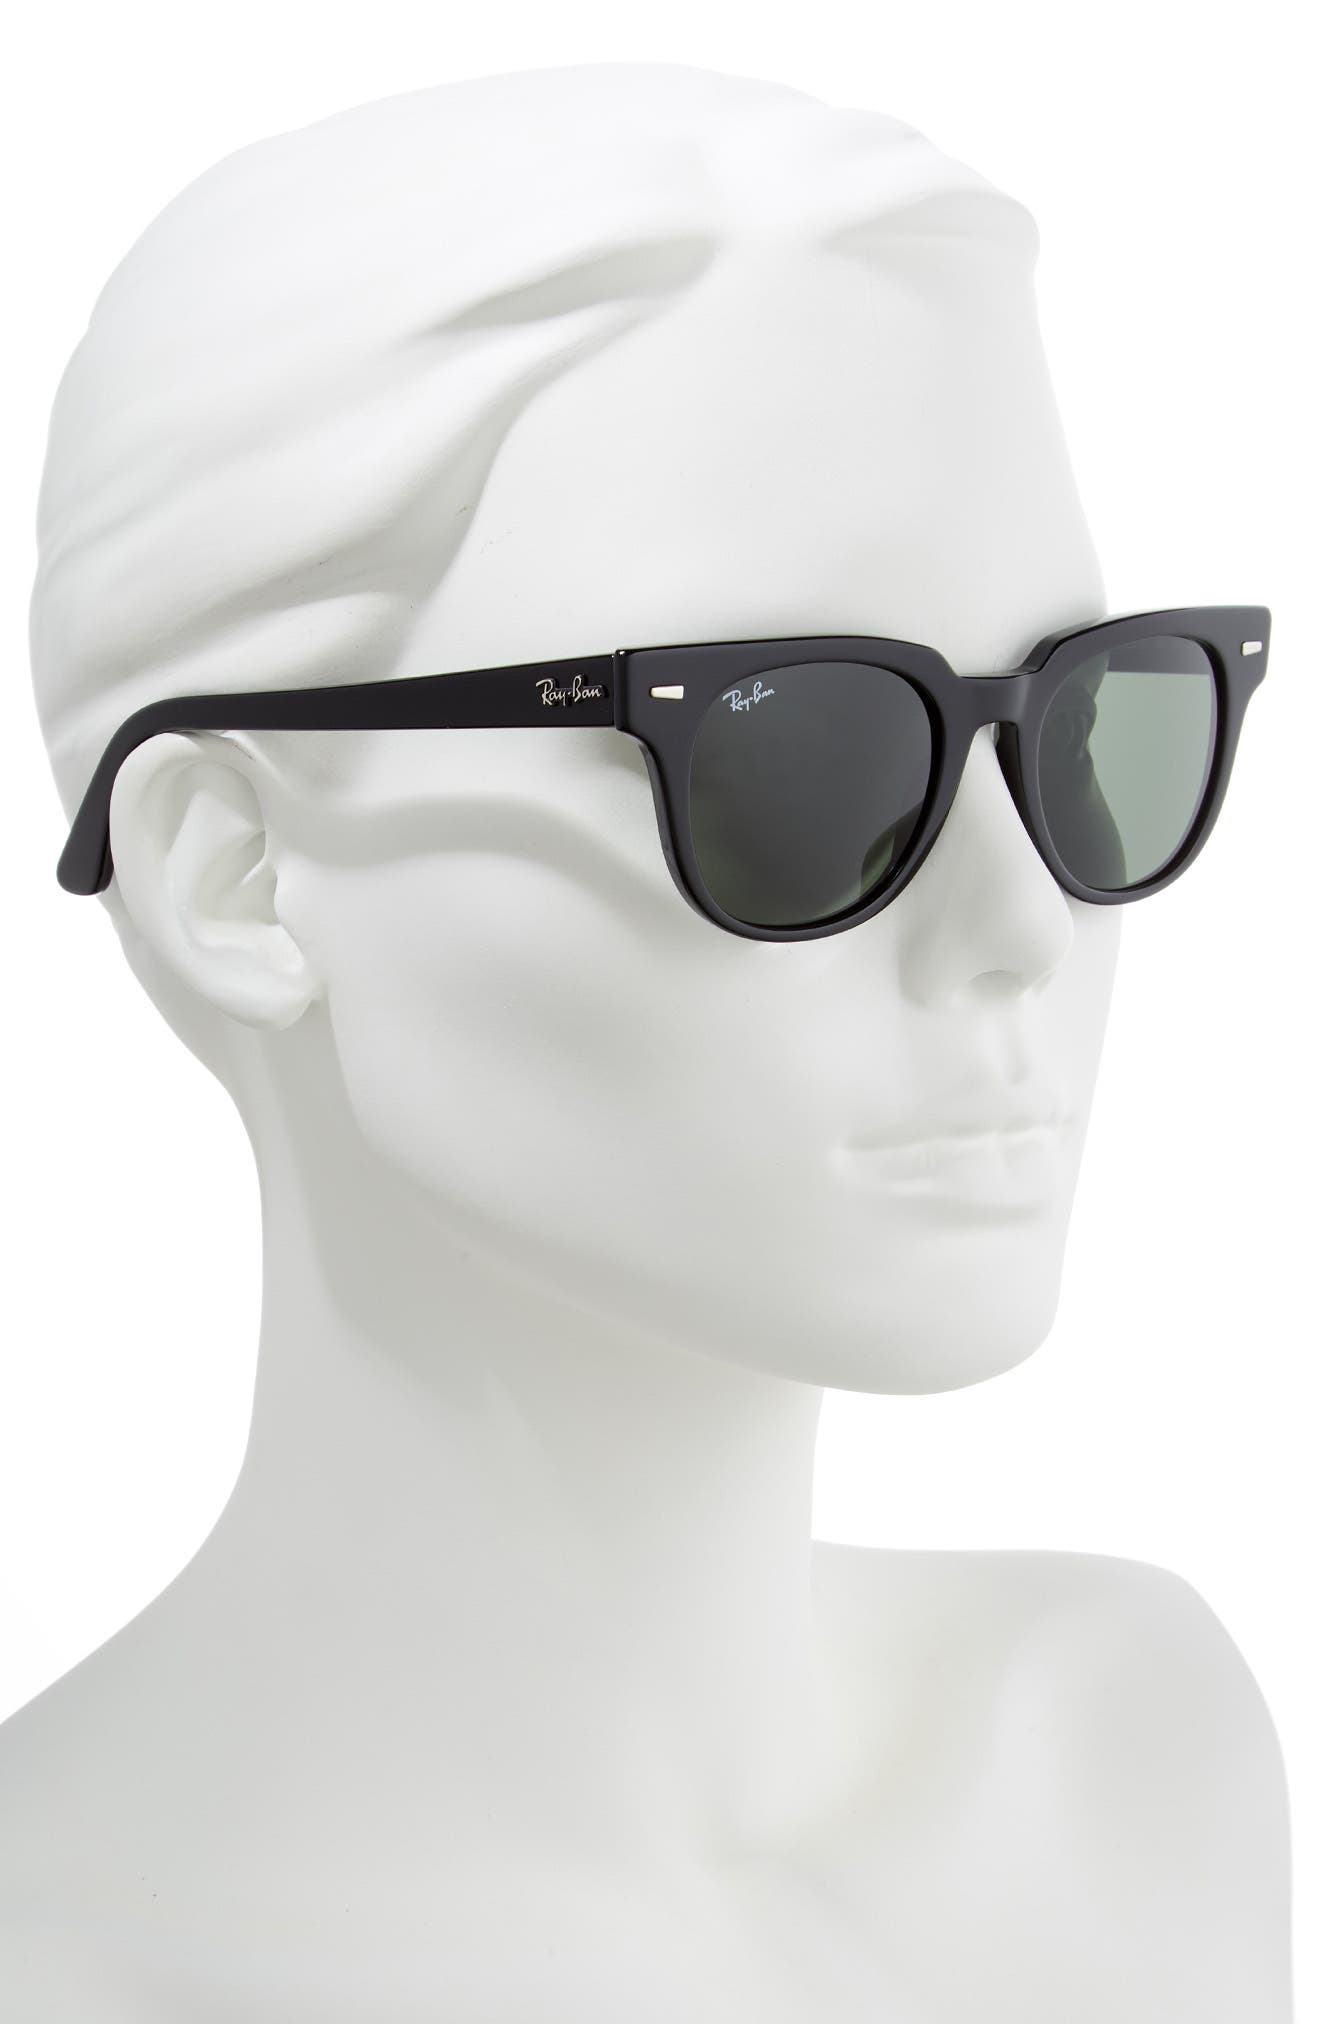 Meteor 50mm Wayfarer Sunglasses,                             Alternate thumbnail 2, color,                             BLACK SOLID